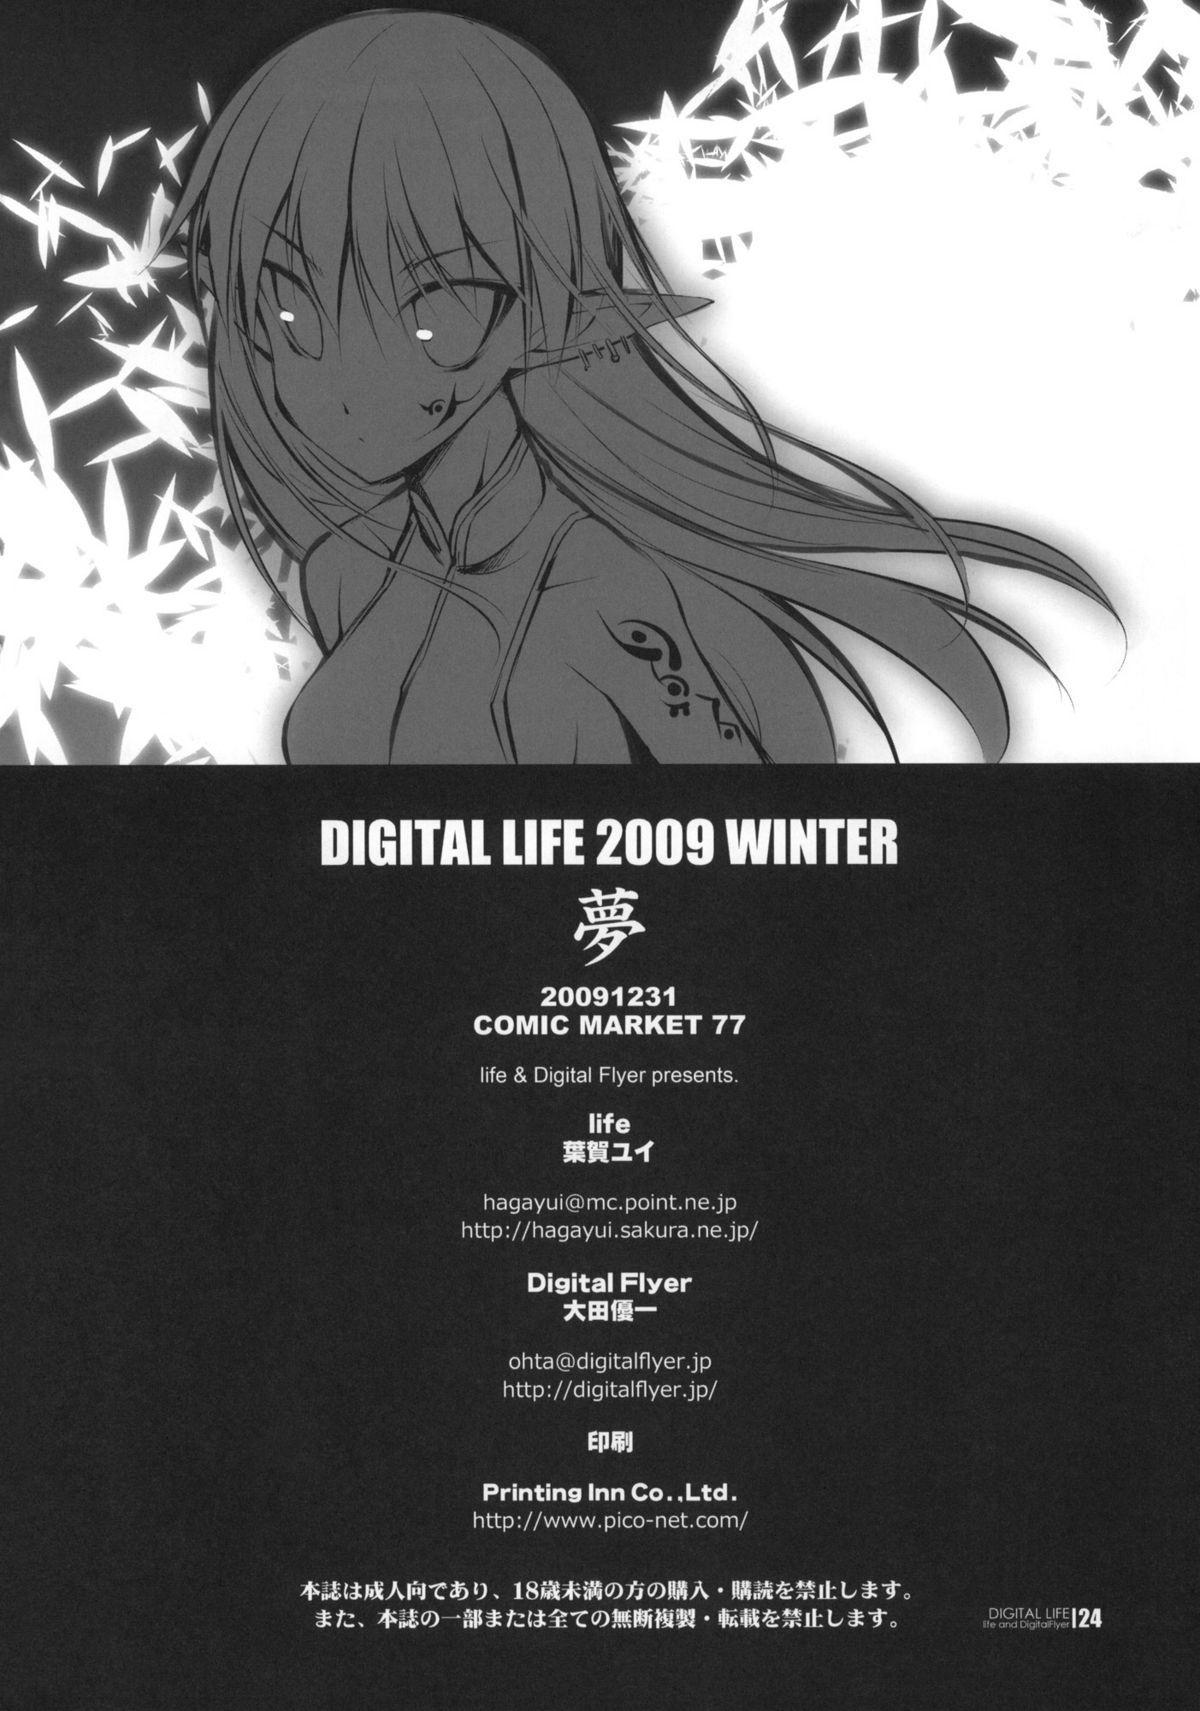 DIGITAL LIFE 2009 WINTER Yume 21